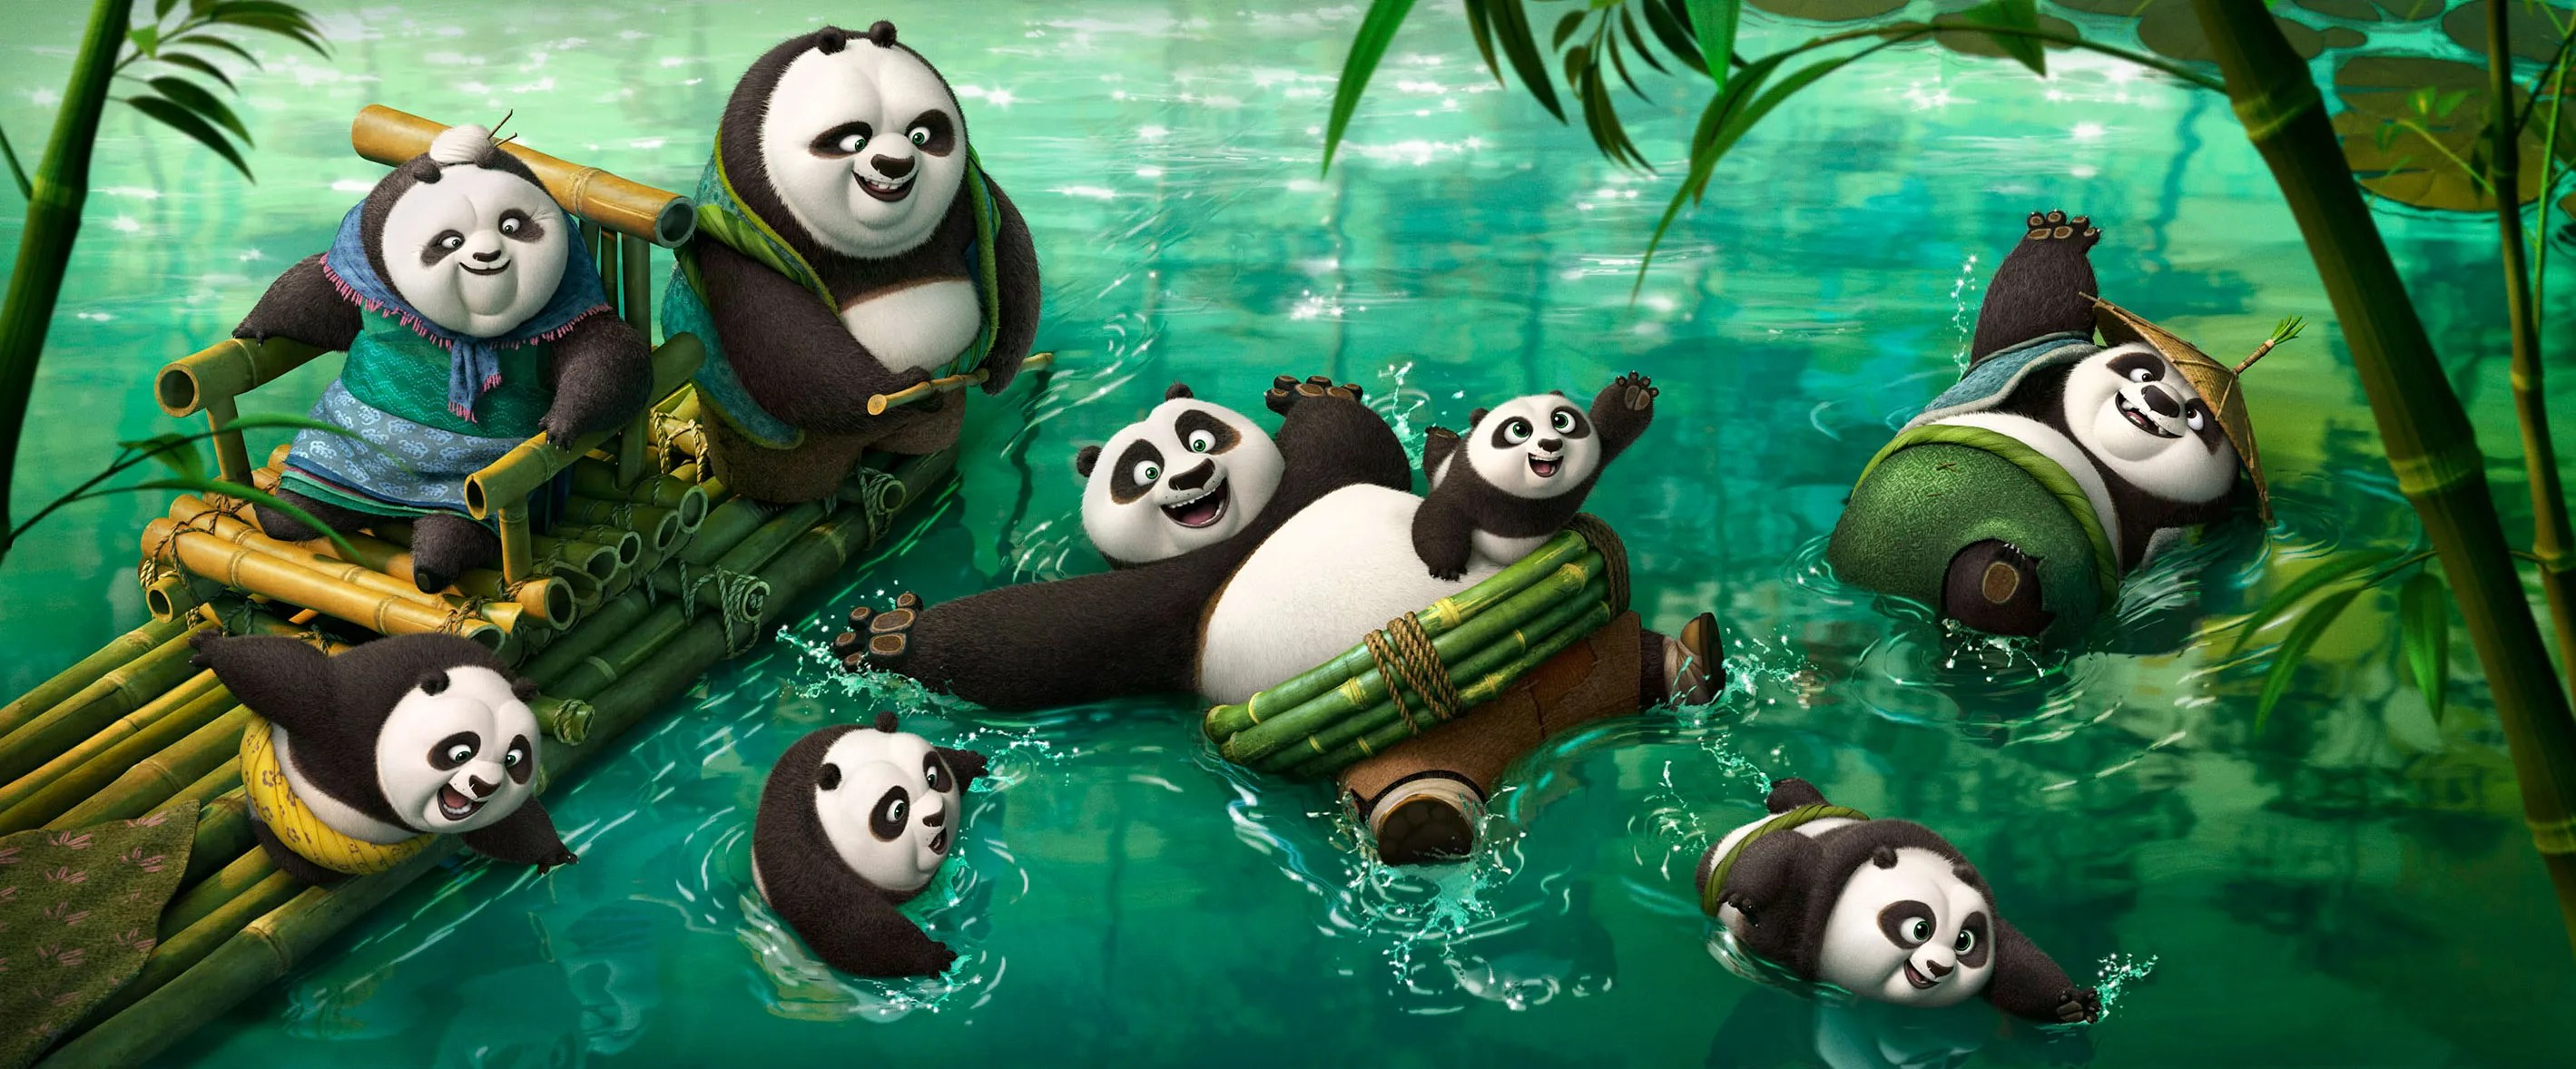 Kung Fu Panda 3 Trailer Featuring Jack Black As Po